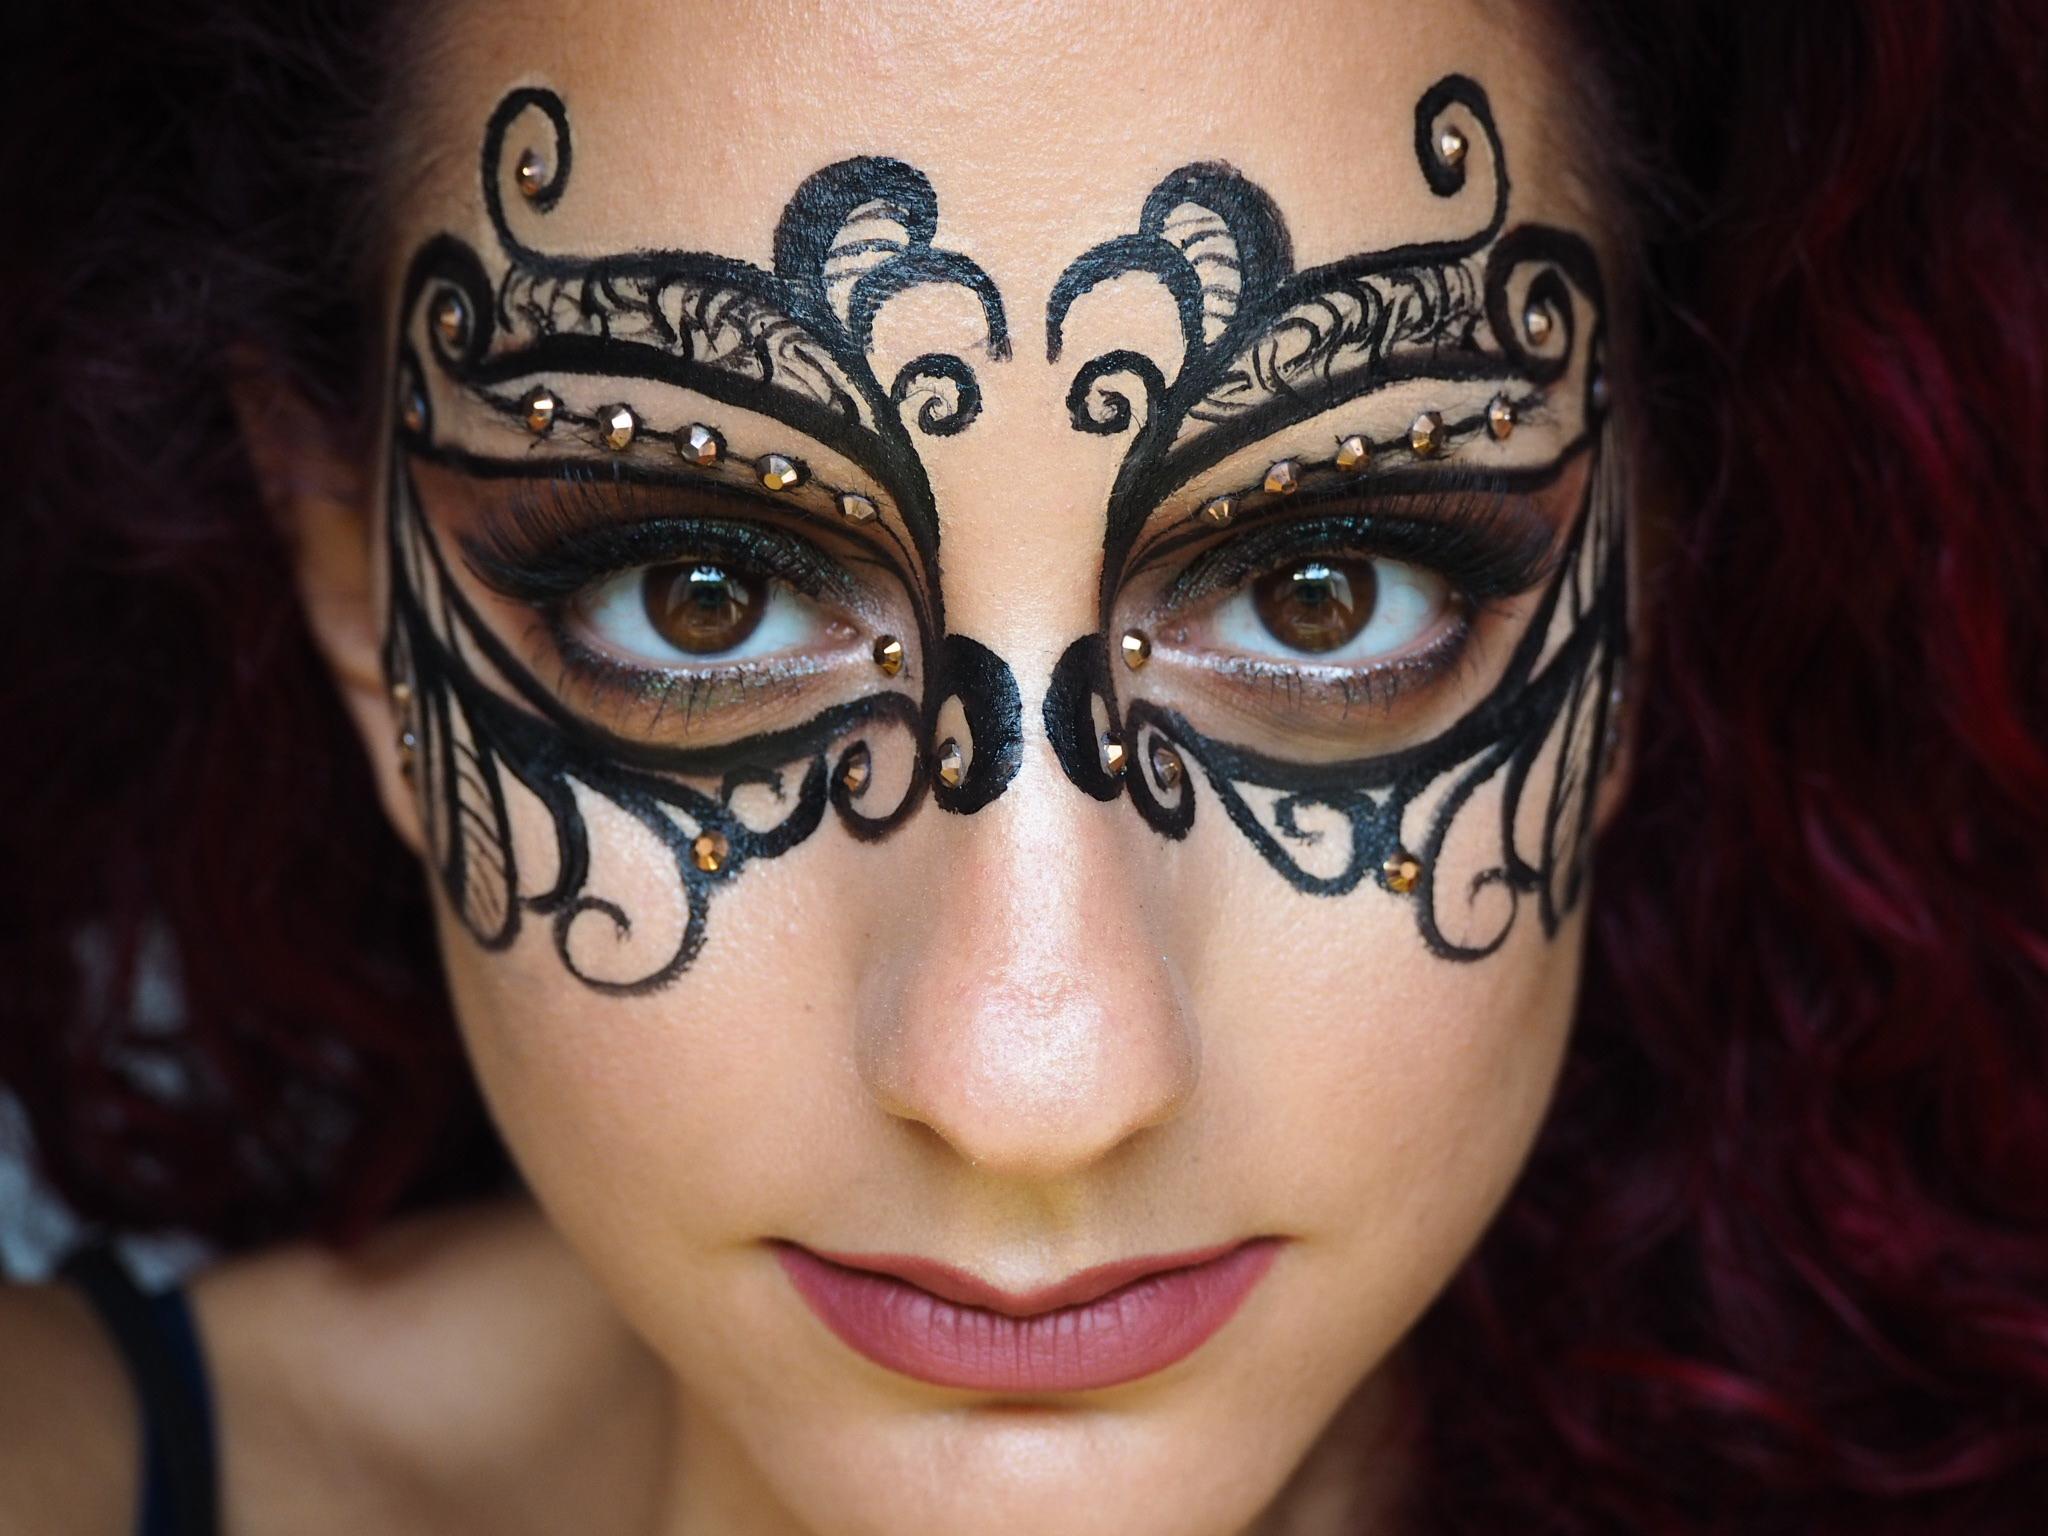 Lace Mask. Masquerade Ball.